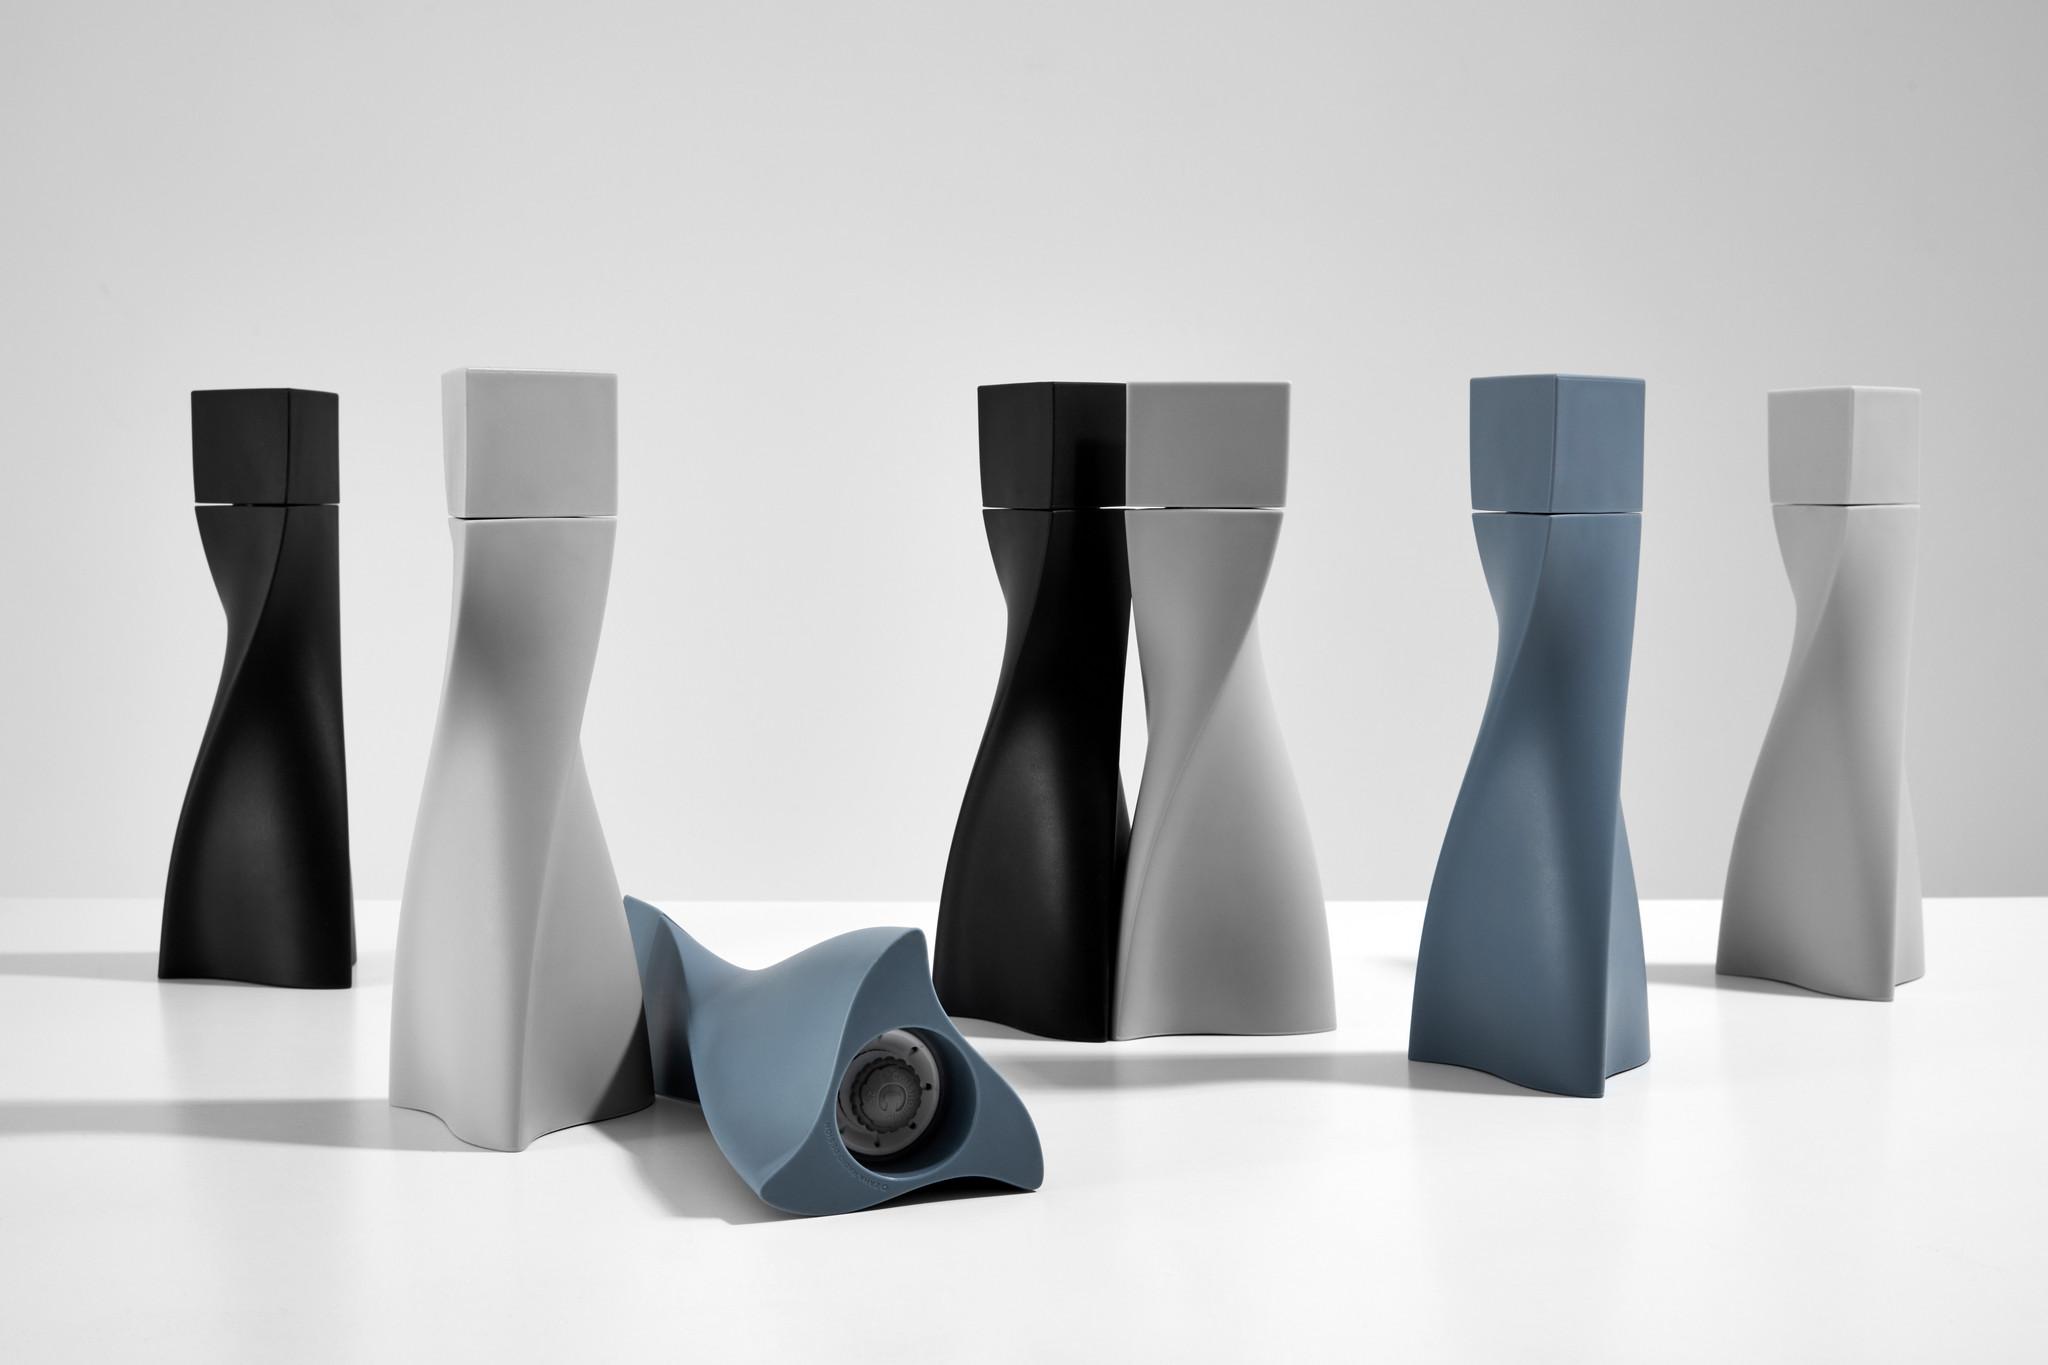 Zaha Hadid Design_Duo Salt and Pepper Grinder_08A.jpg